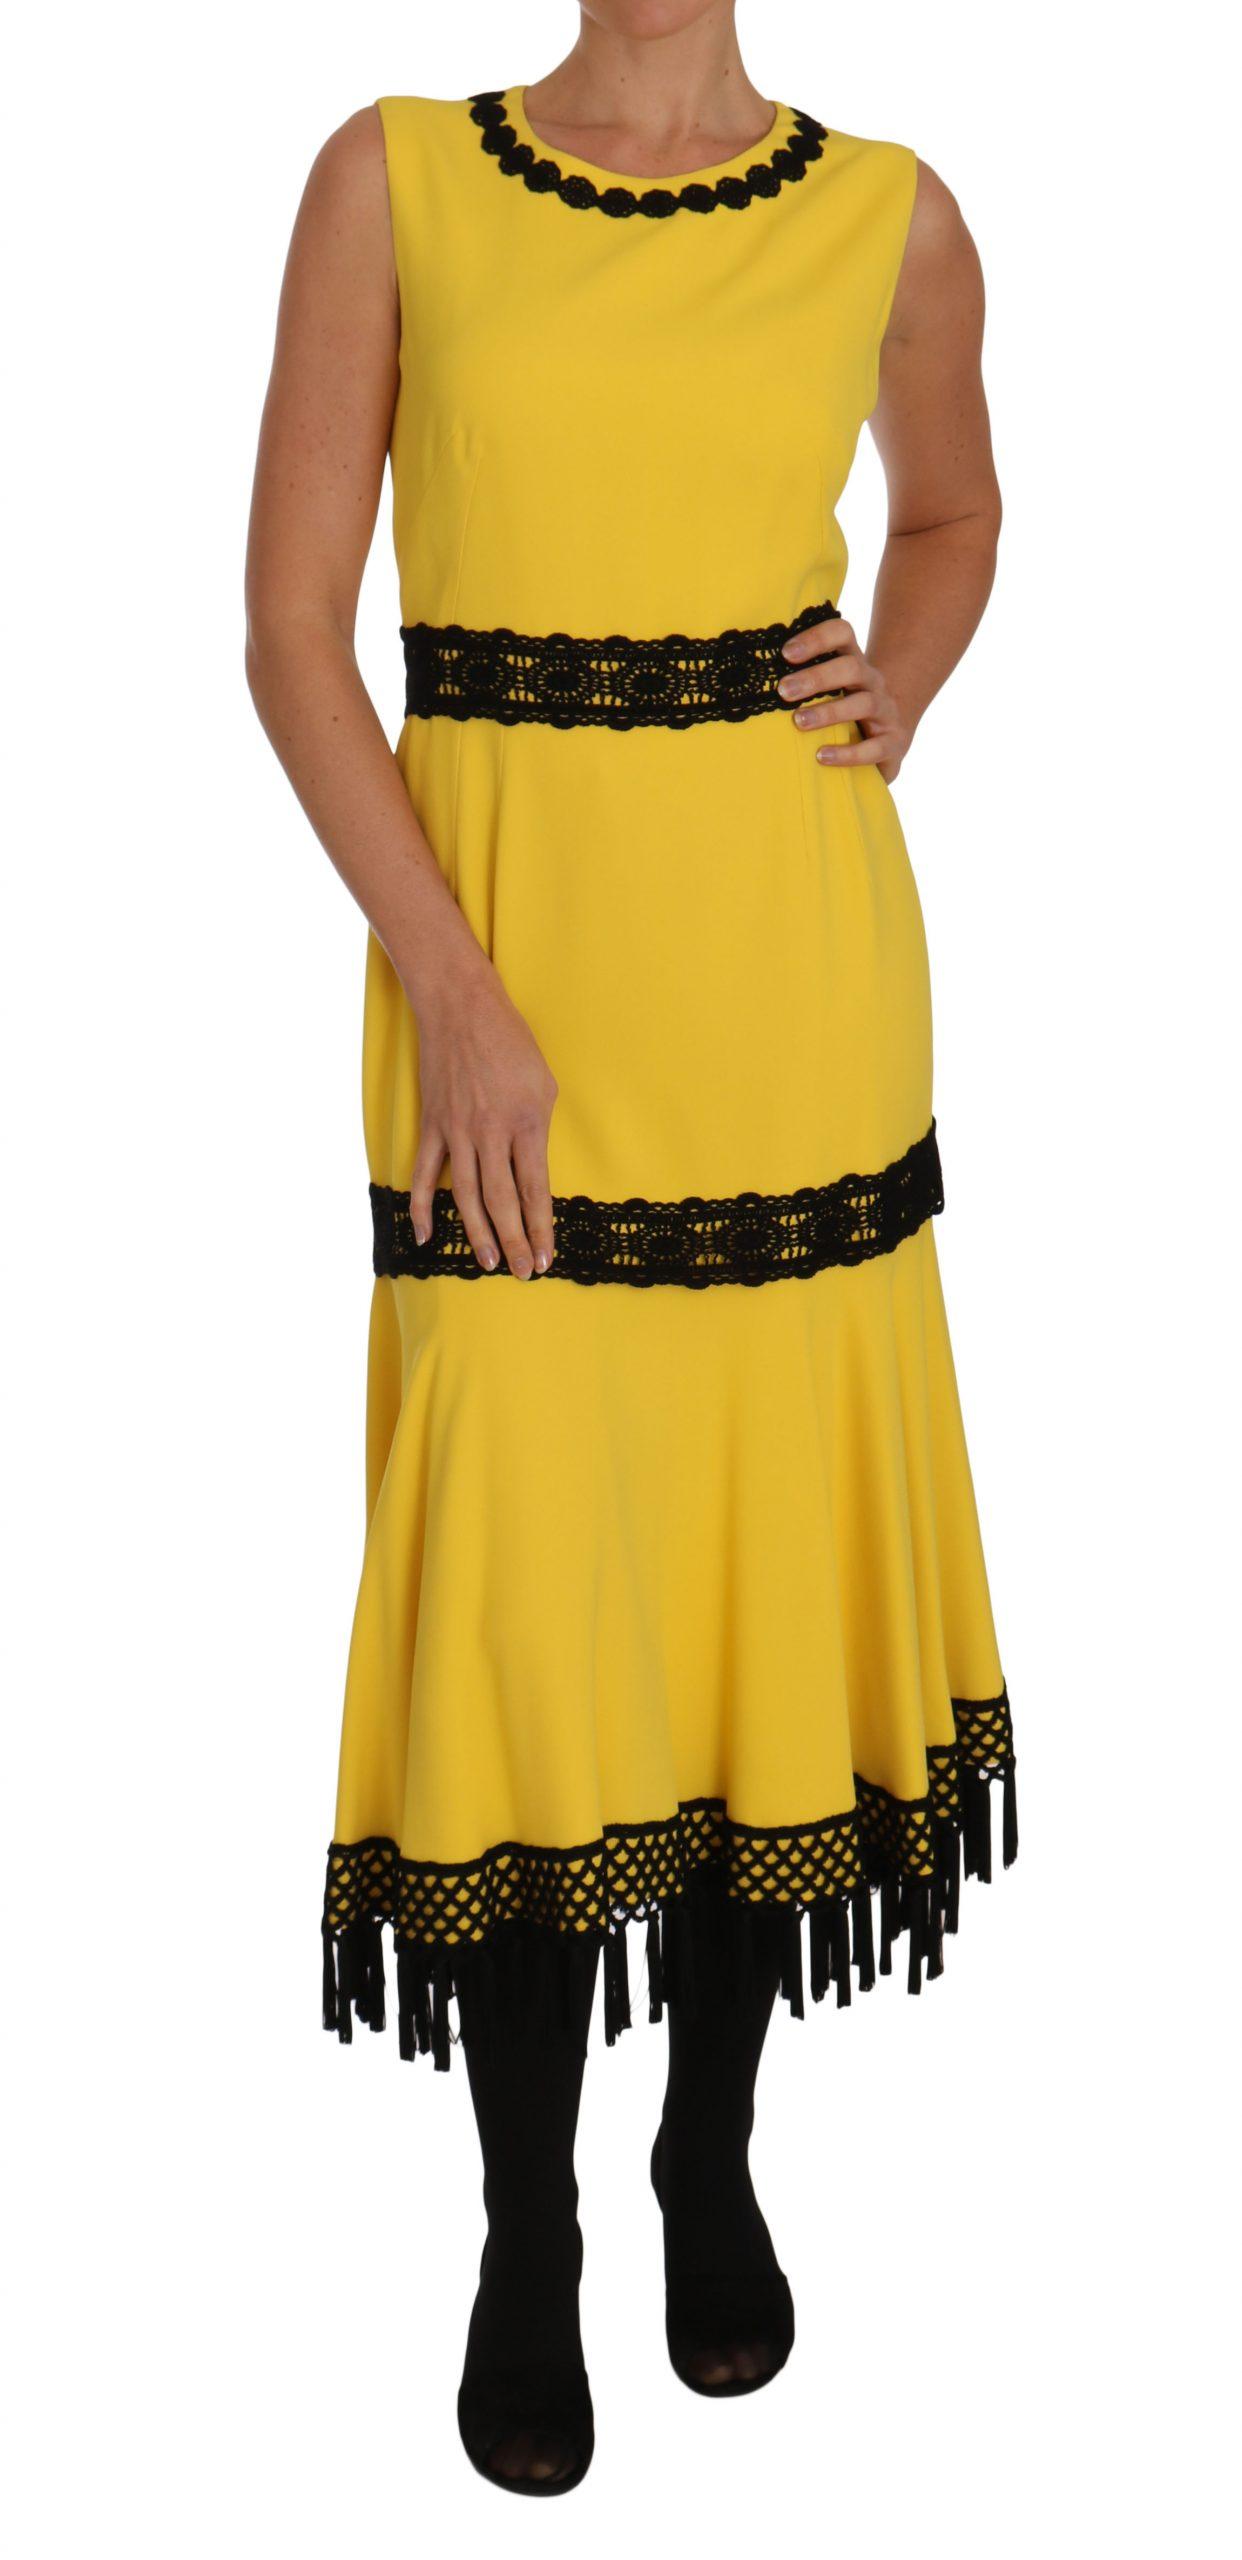 Dolce & Gabbana Women's Dress Floral Lace Fringes Sheath Dress Yellow DR1468 - IT46   L